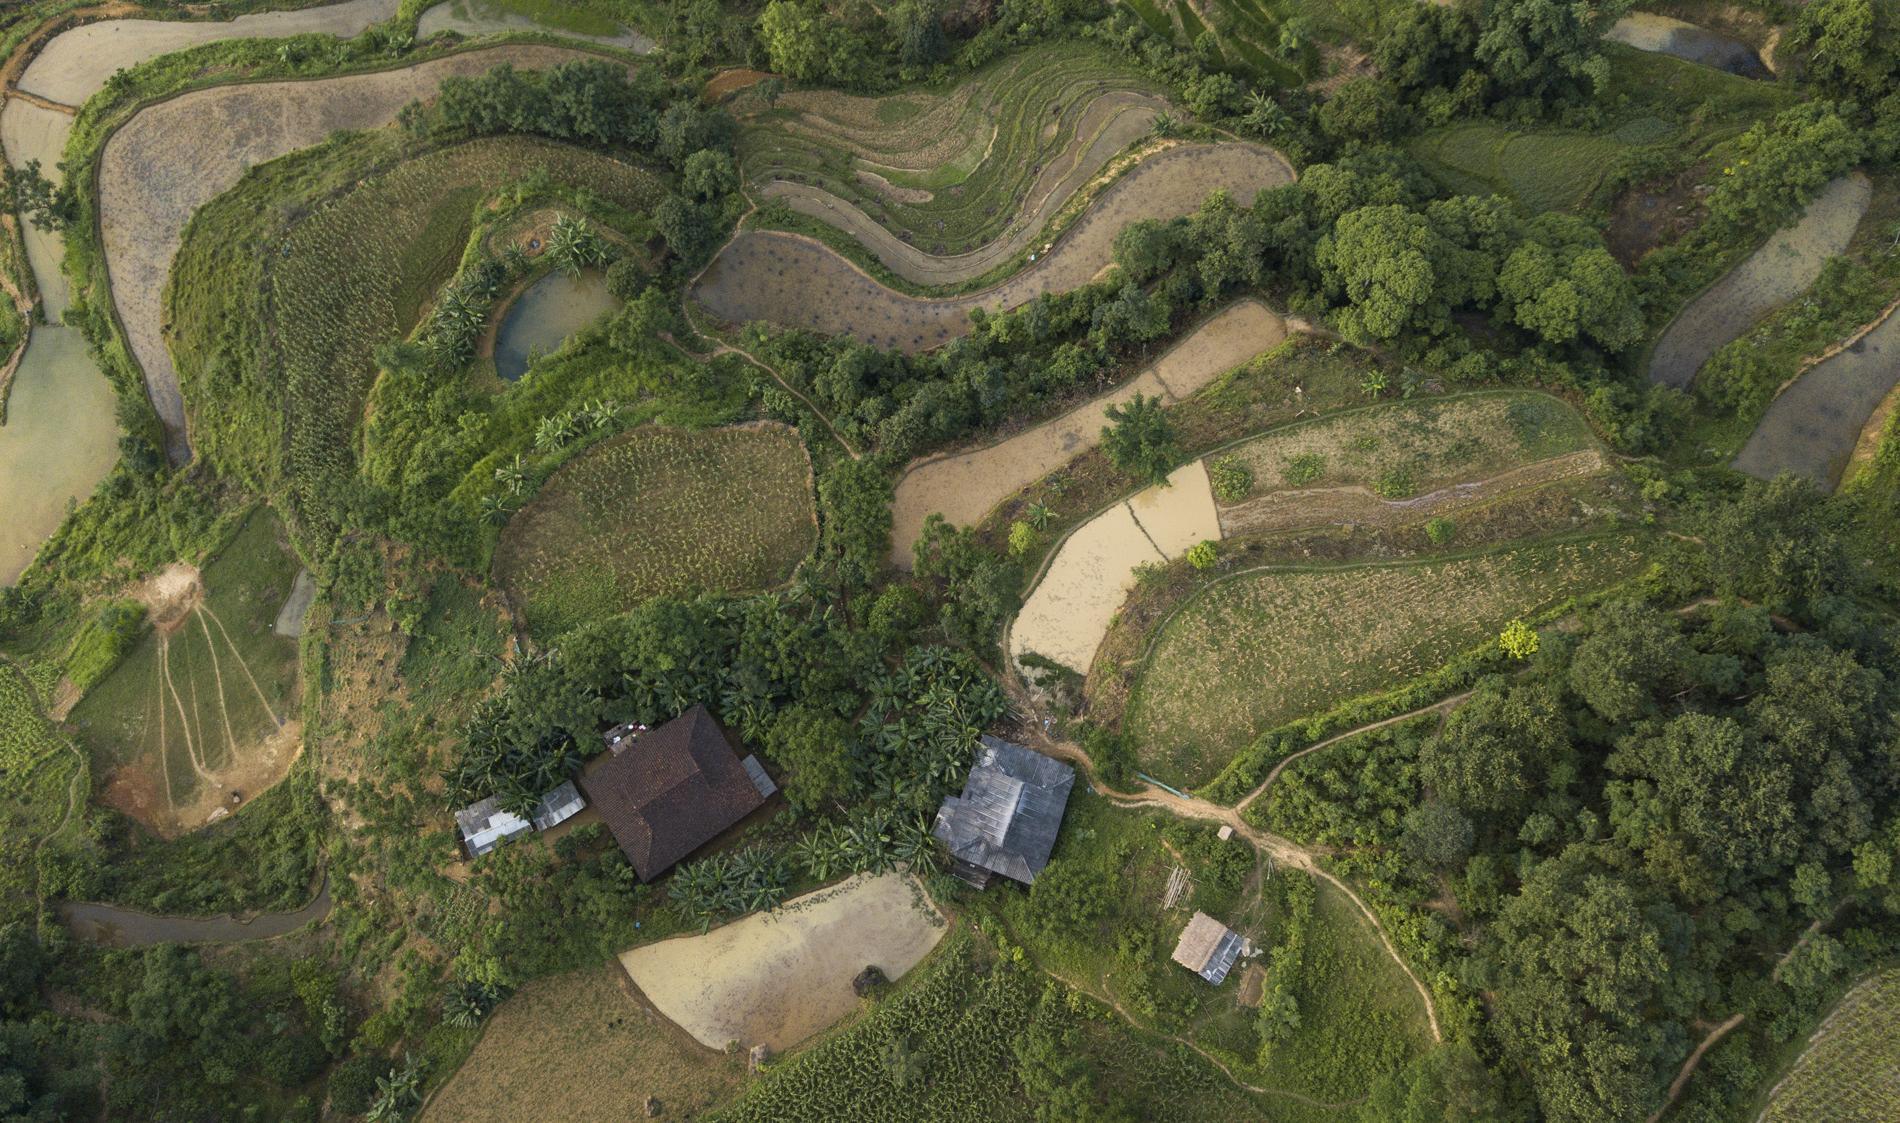 Voyage solidaire Vietnam : Vision du Monde - Photo 3